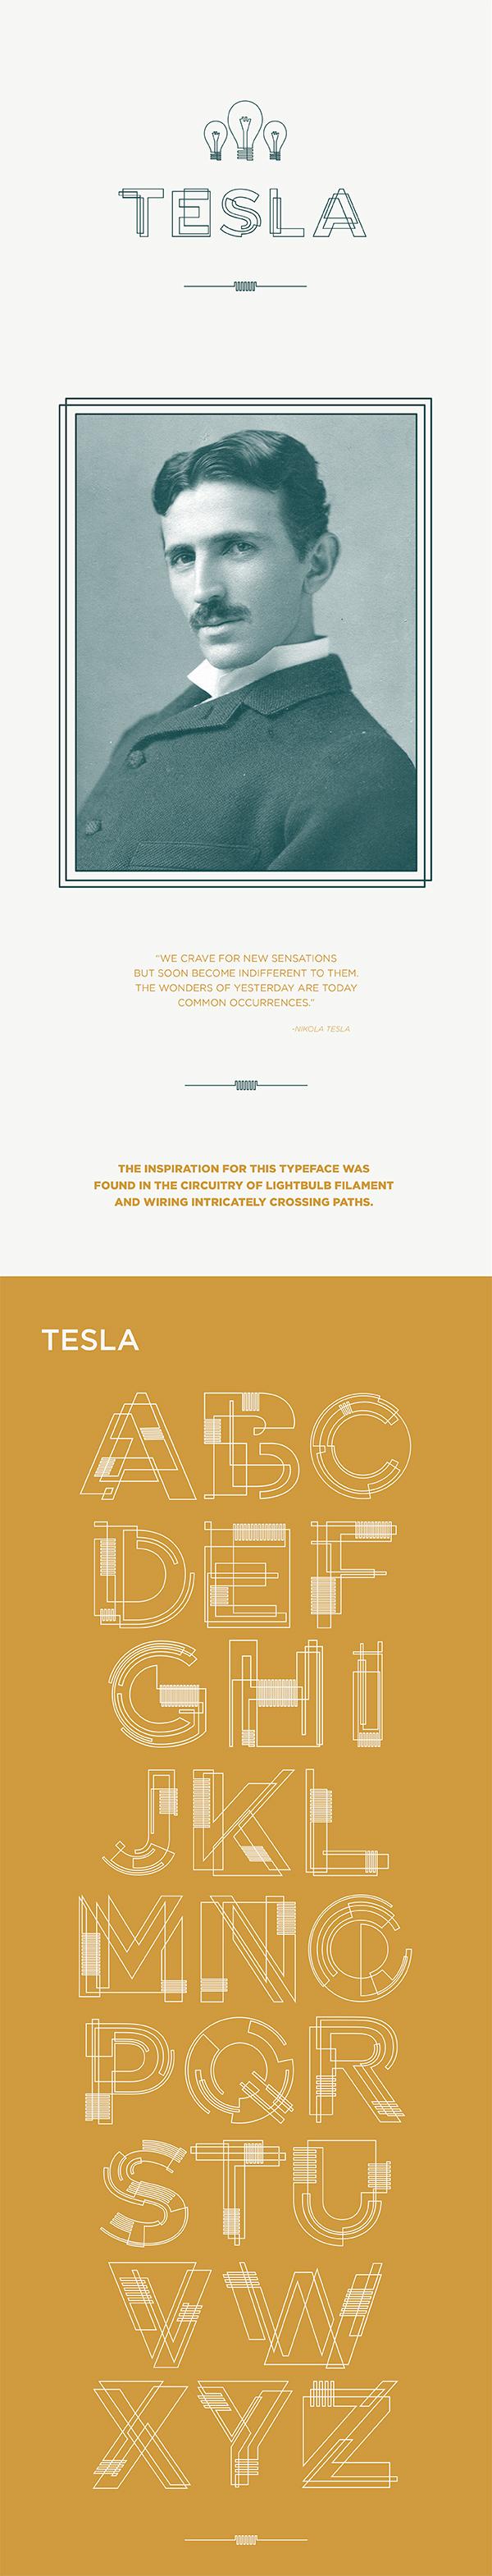 KU university of kansas tesla nikola electricity free font Typeface new line intricate Free font download #Colossal #madethis